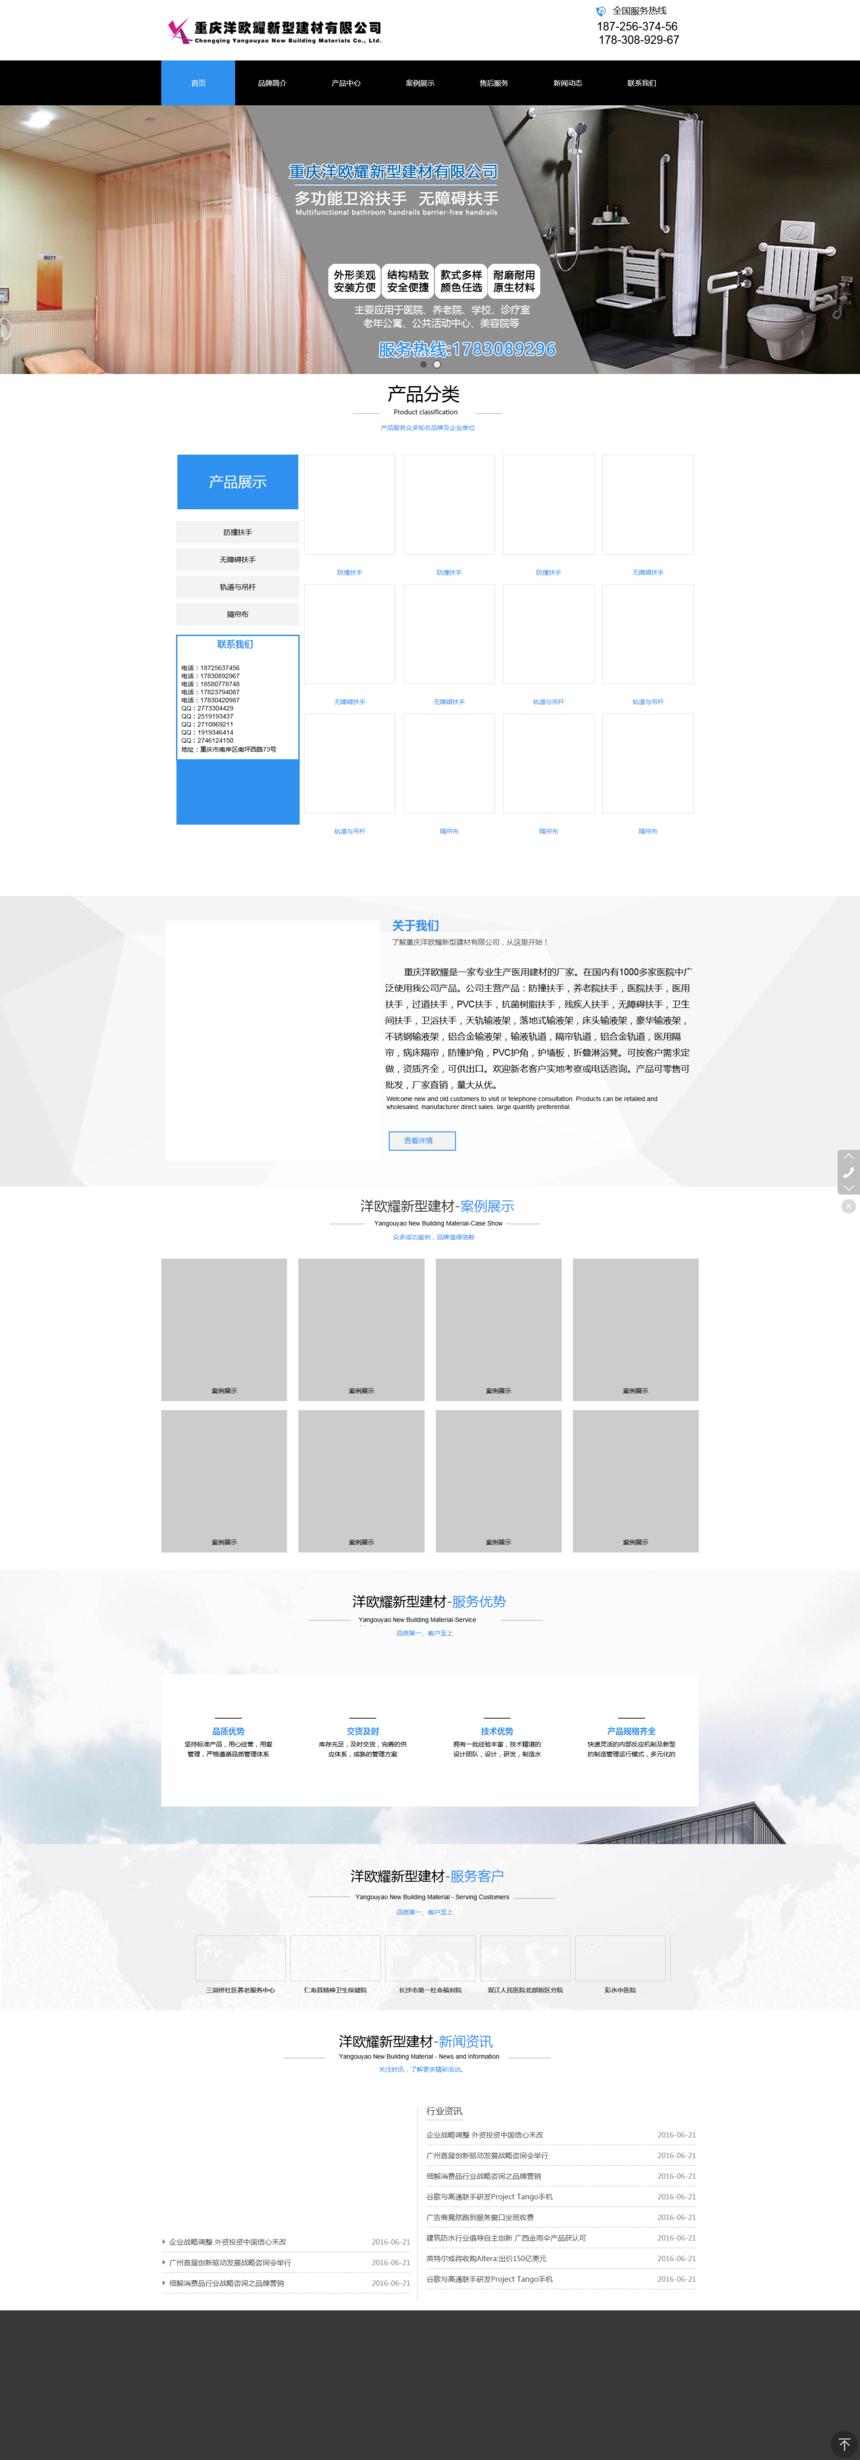 bobAPP应用喳喳老火锅丨火锅加盟丨火锅加盟哪家好丨老火锅加盟.png